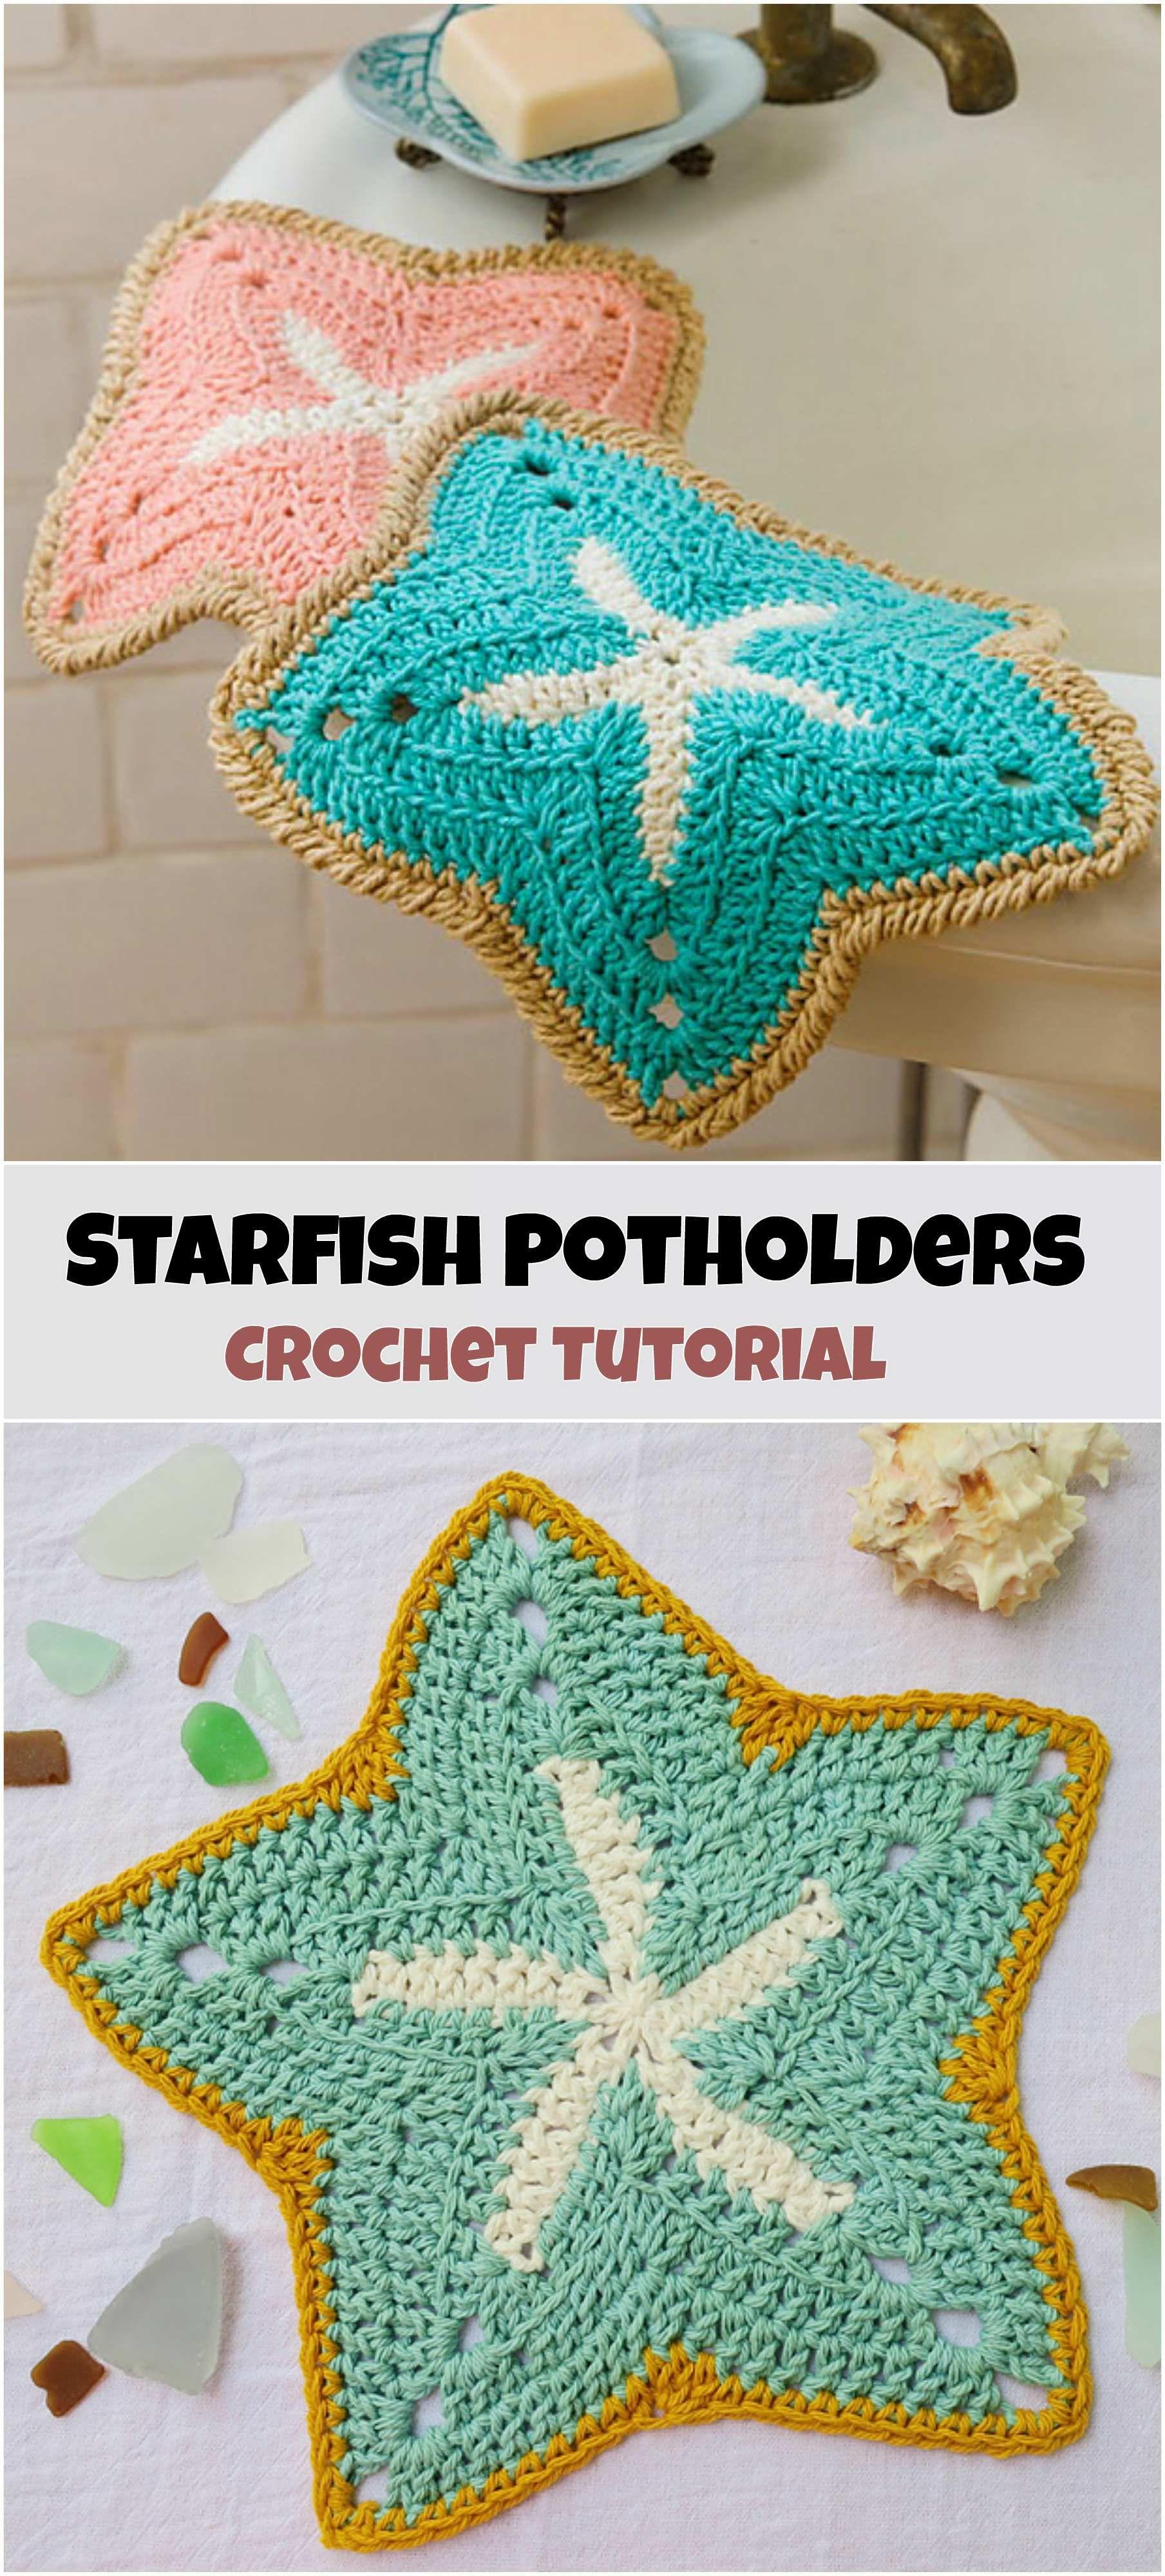 Crochet Starfish Potholders | Crochet | Pinterest | Frascos, Macetas ...